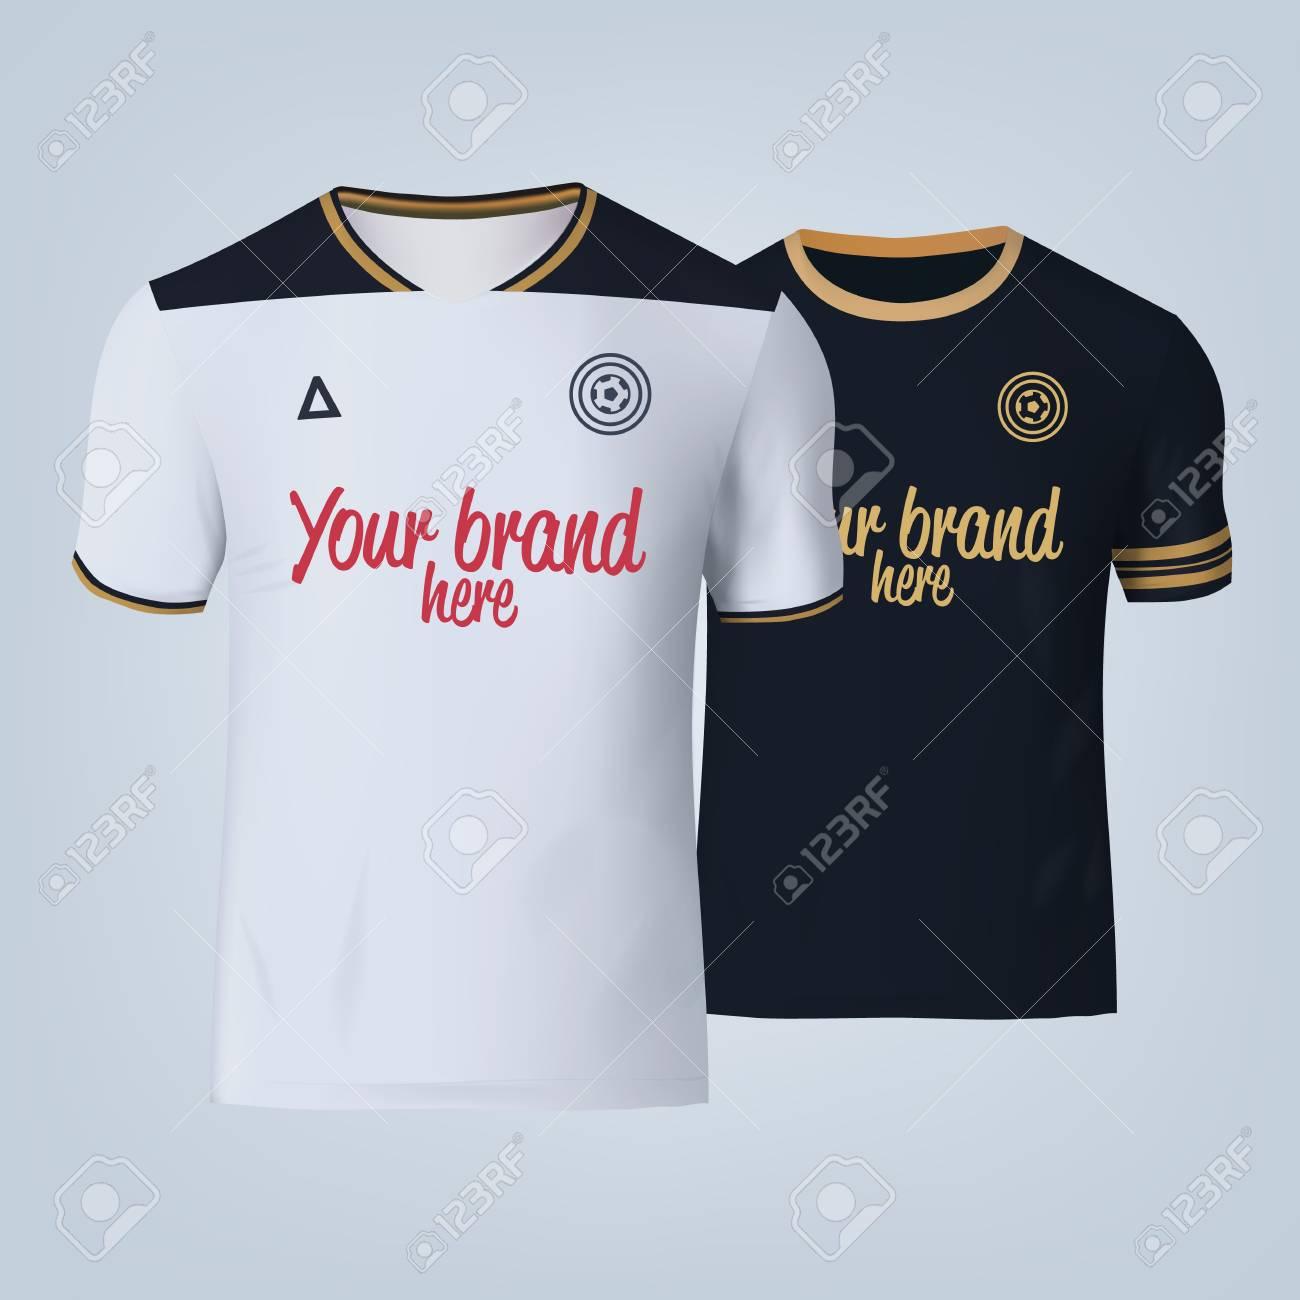 Vector illustration of football t-shirt template. - 84013132